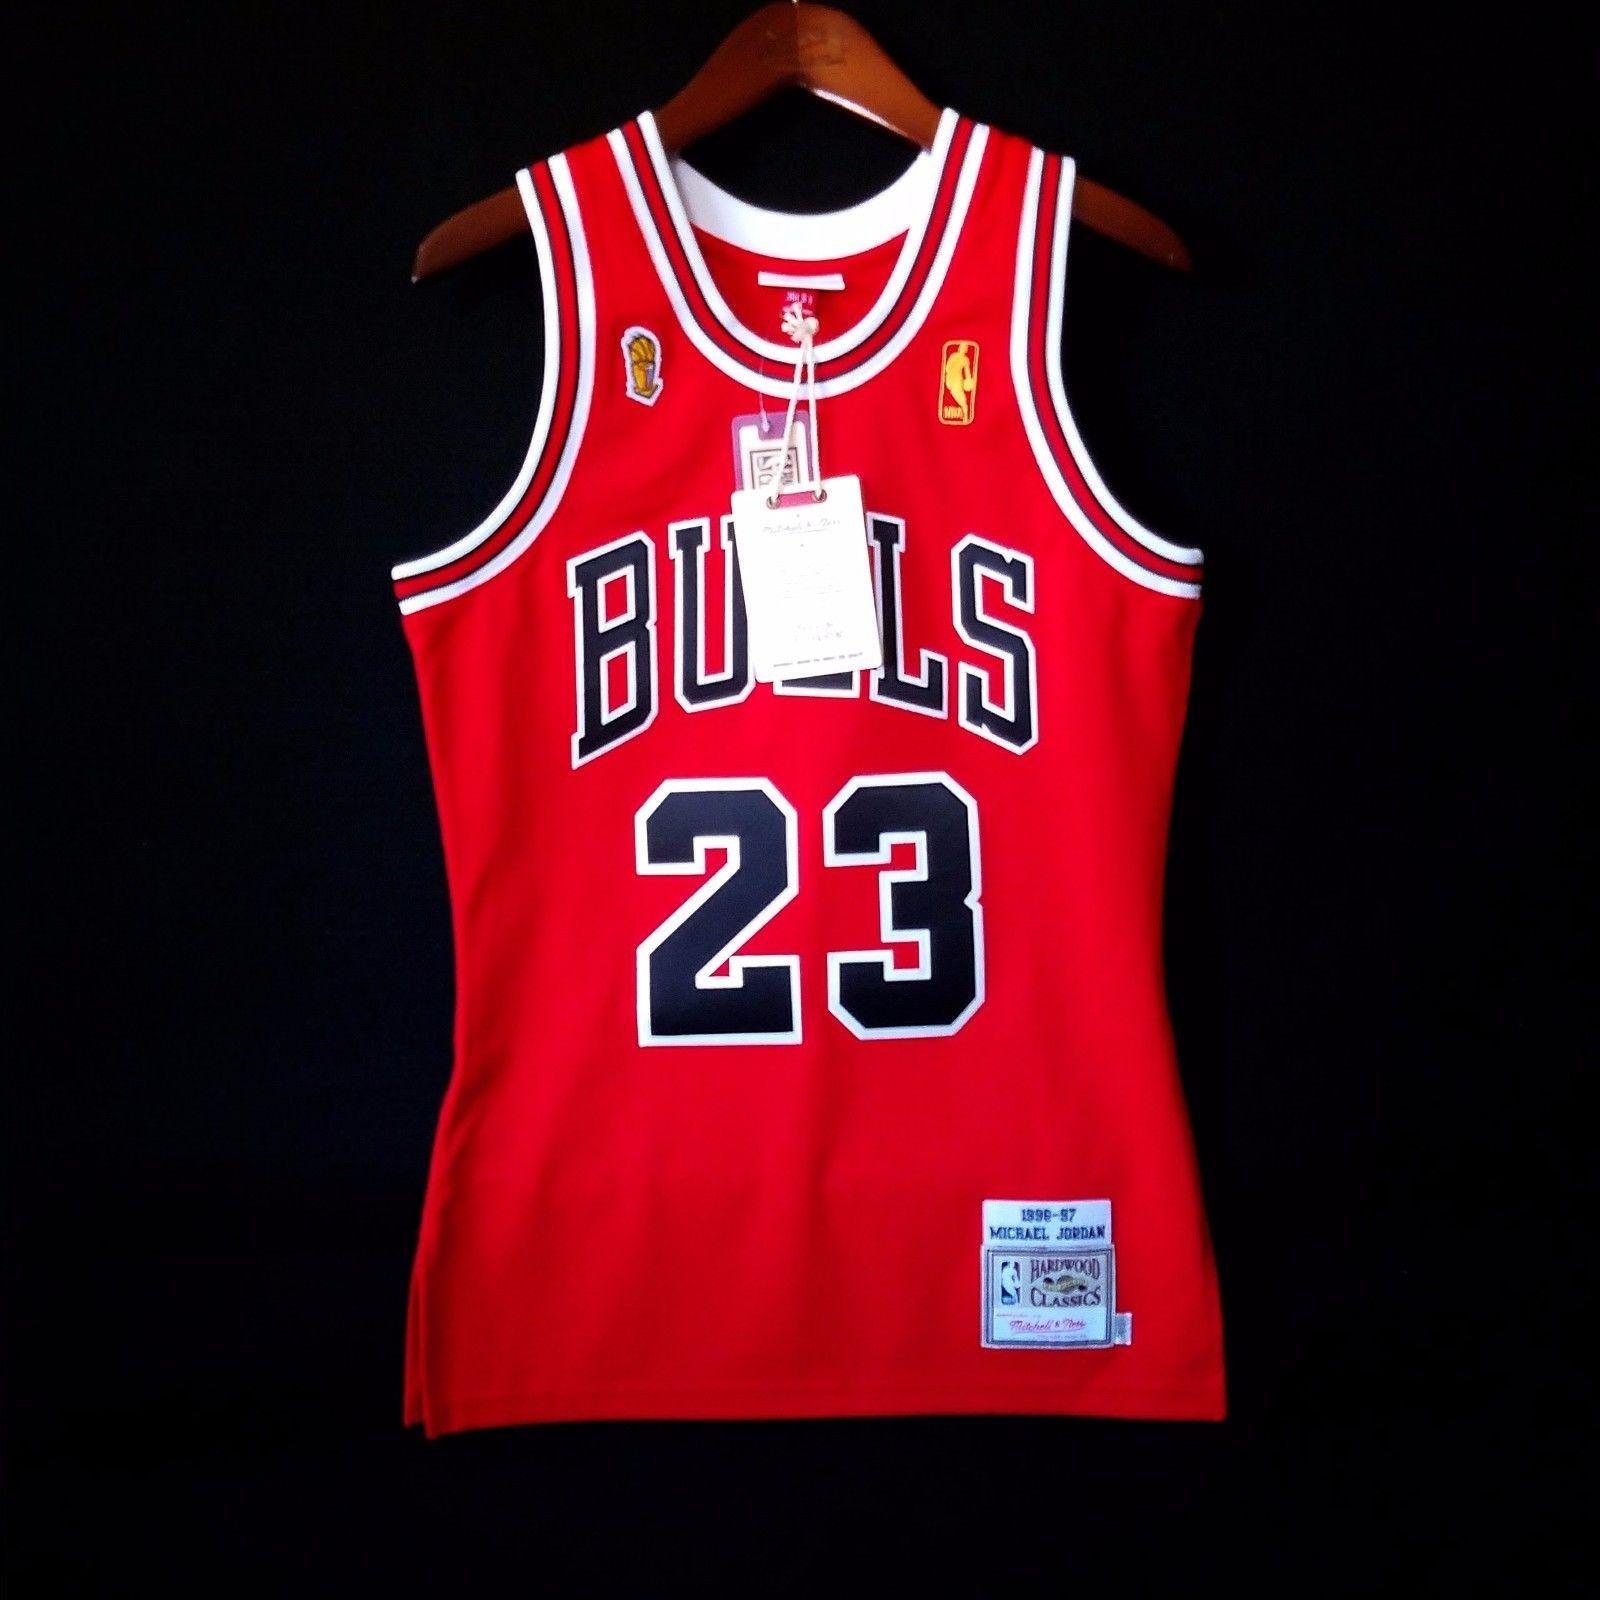 online retailer 96772 ec7a1 100% Authentic Michael Jordan Mitchell Ness 96 97 Finals ...